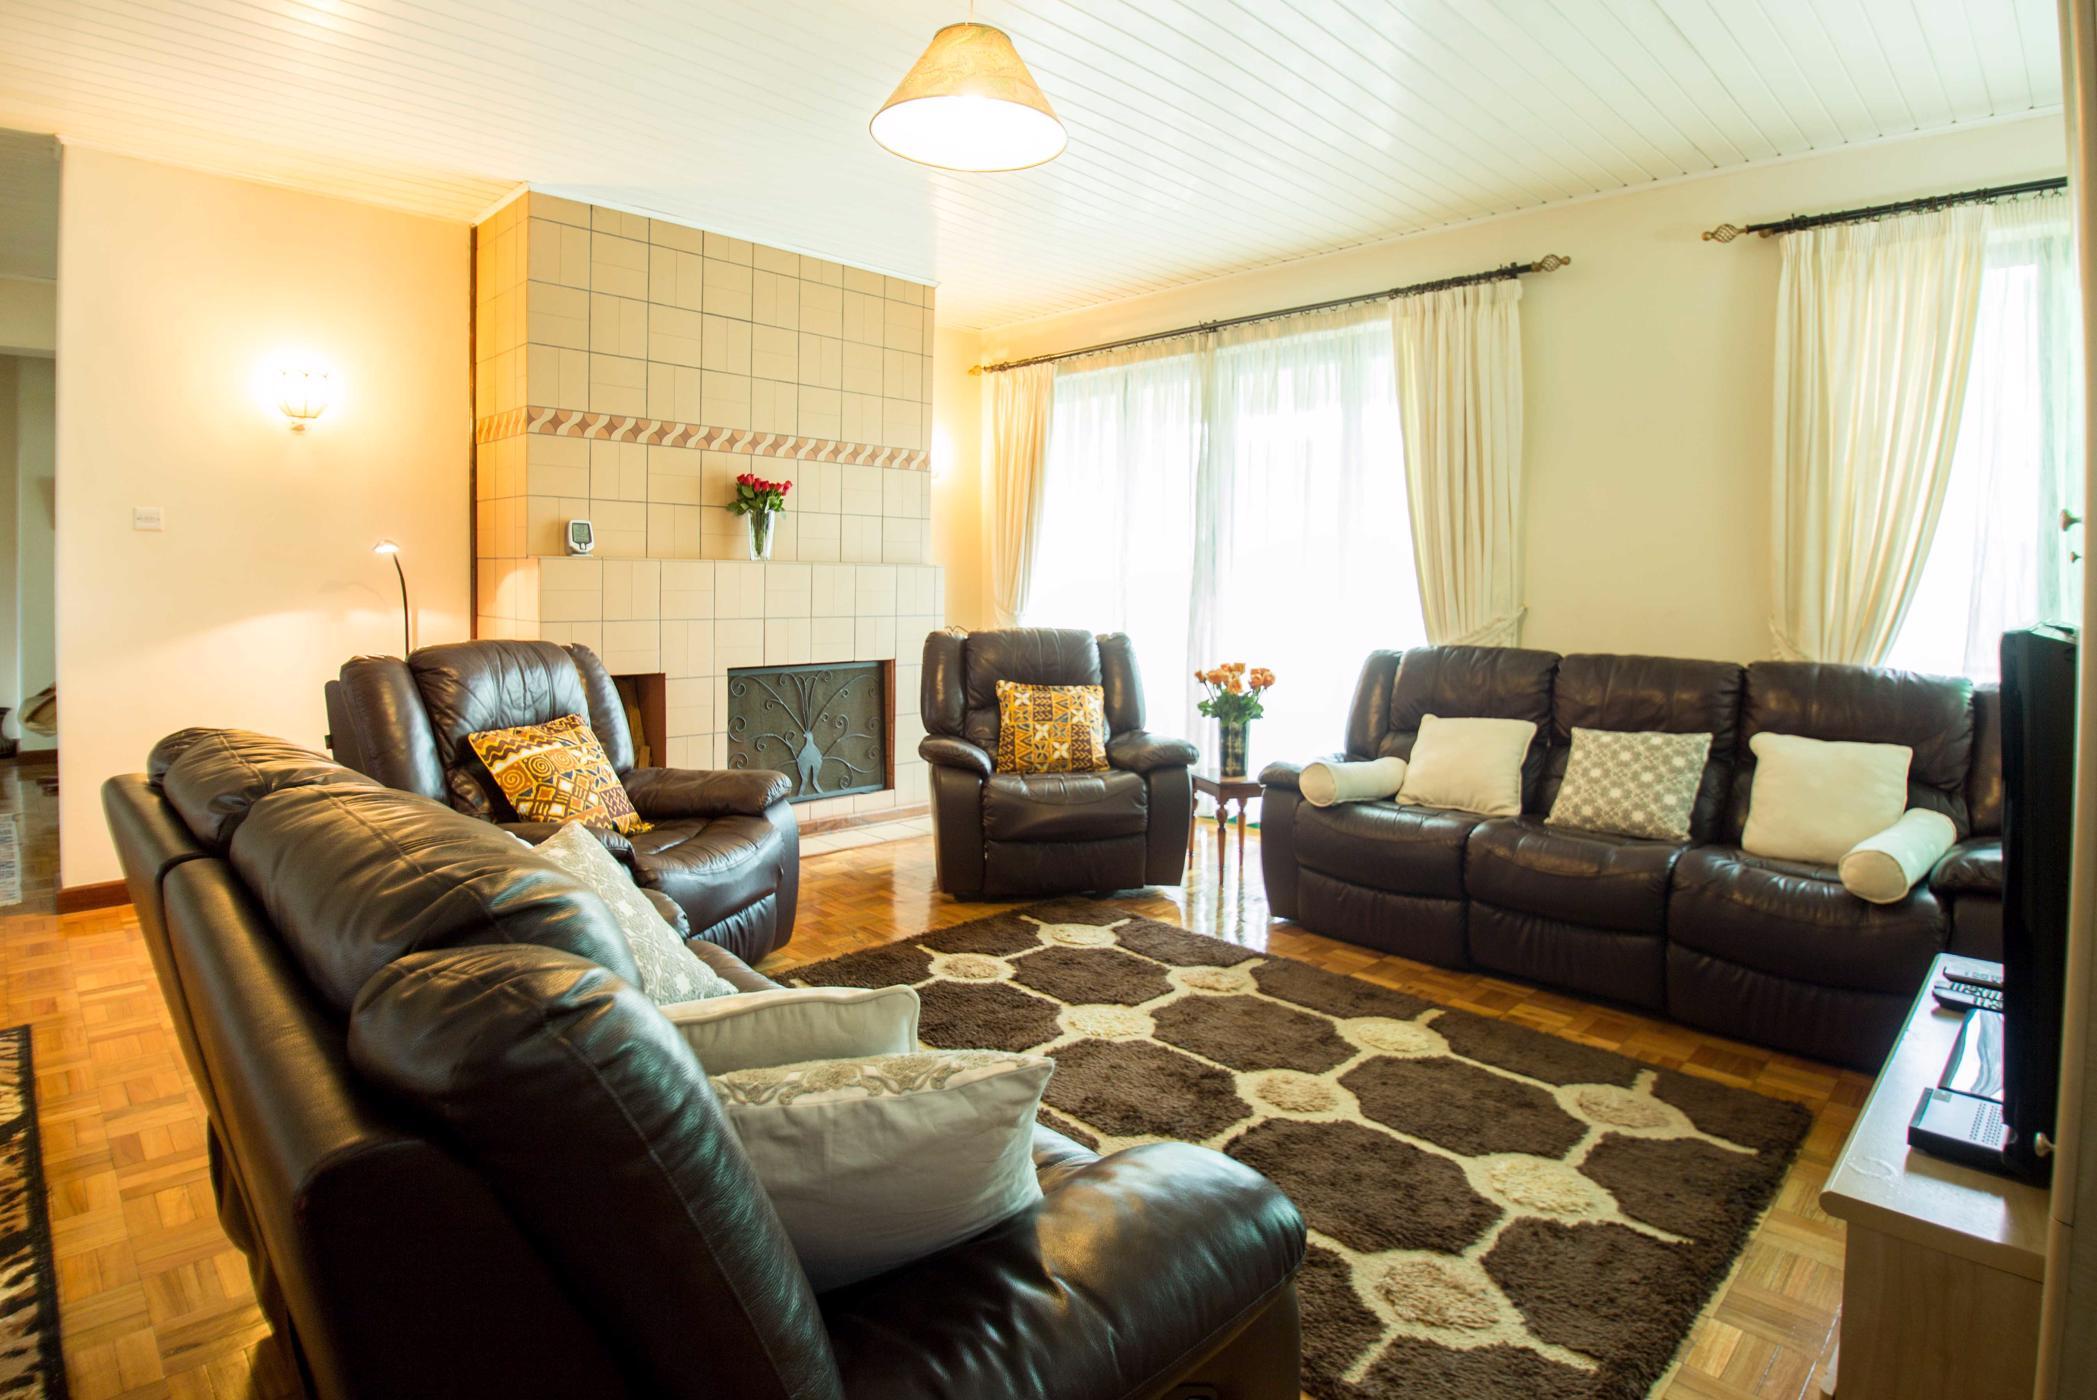 Apartment to rent in Lavington (Kenya)